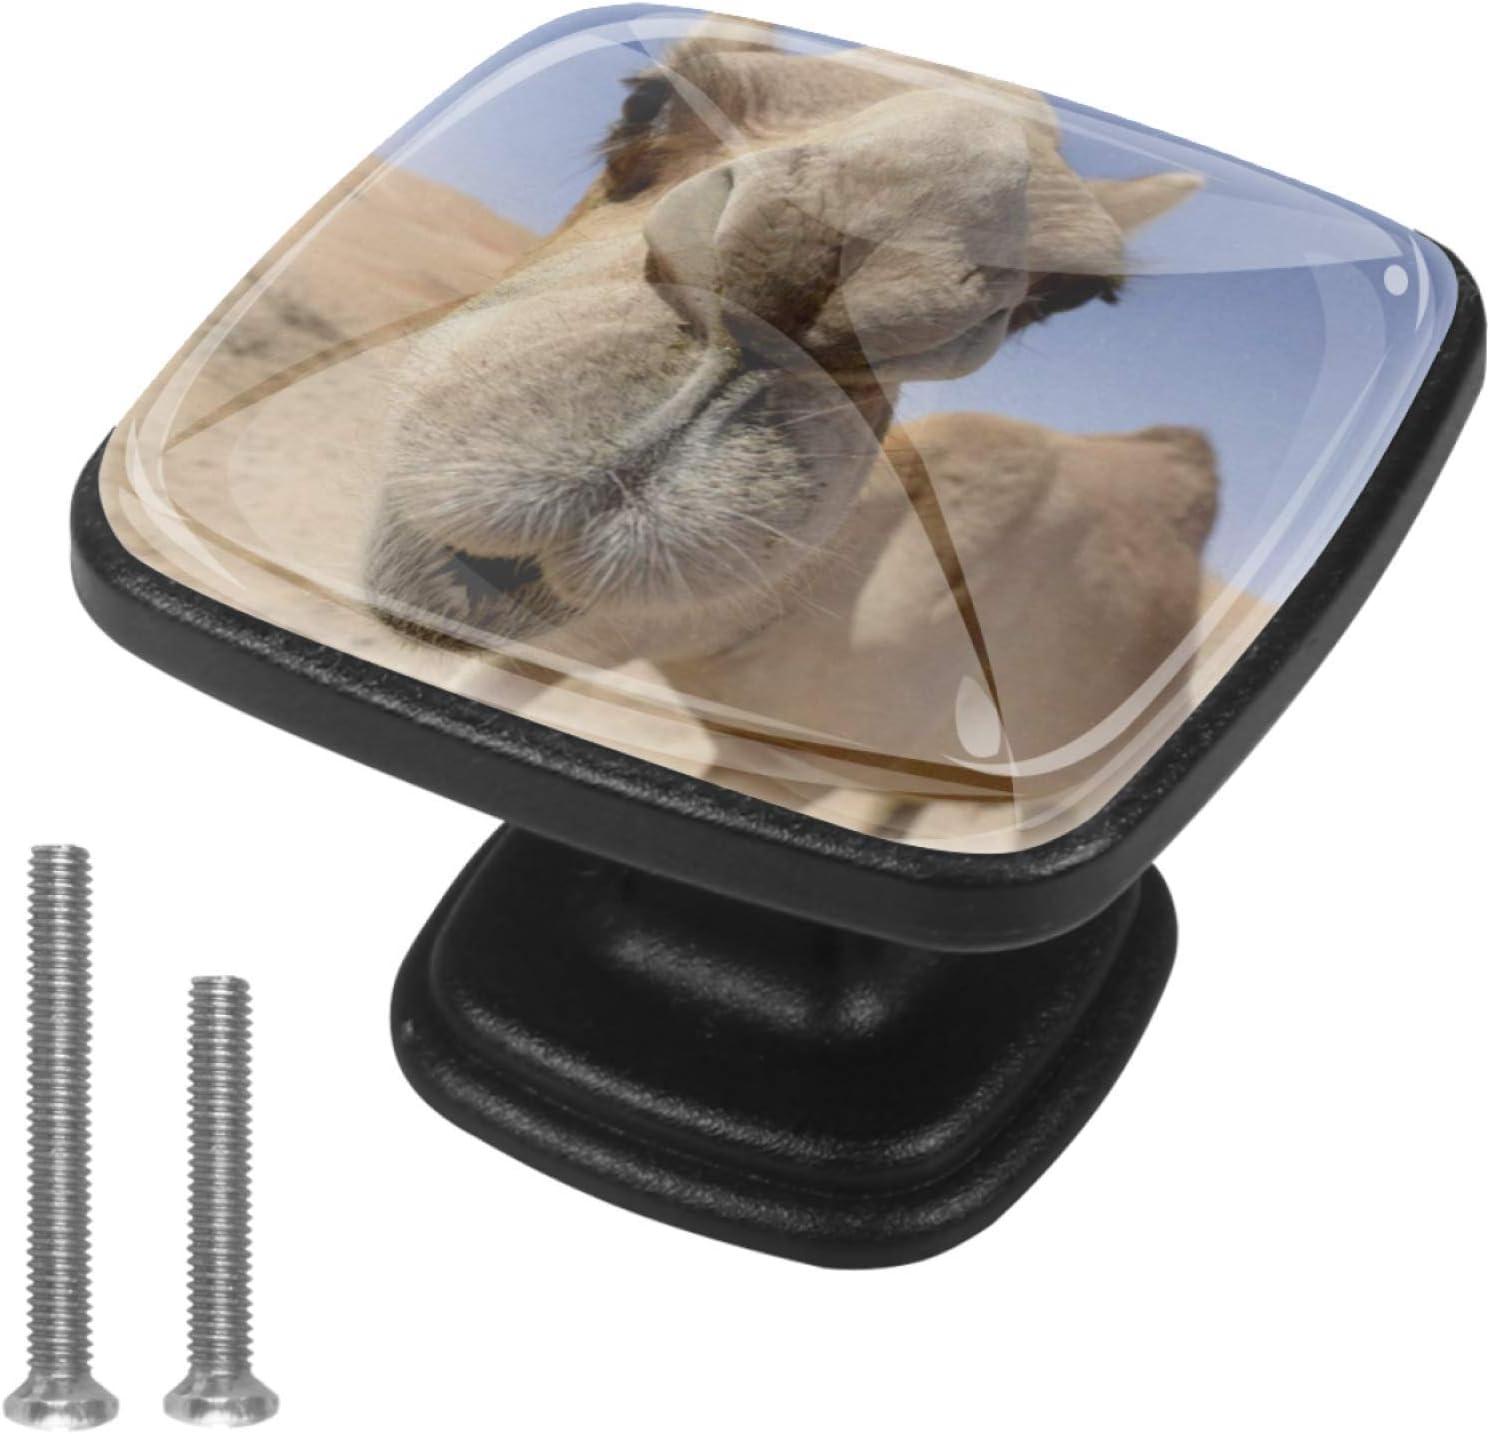 Round Cabinet Hardware Knob 4 Pack Finally resale start 100